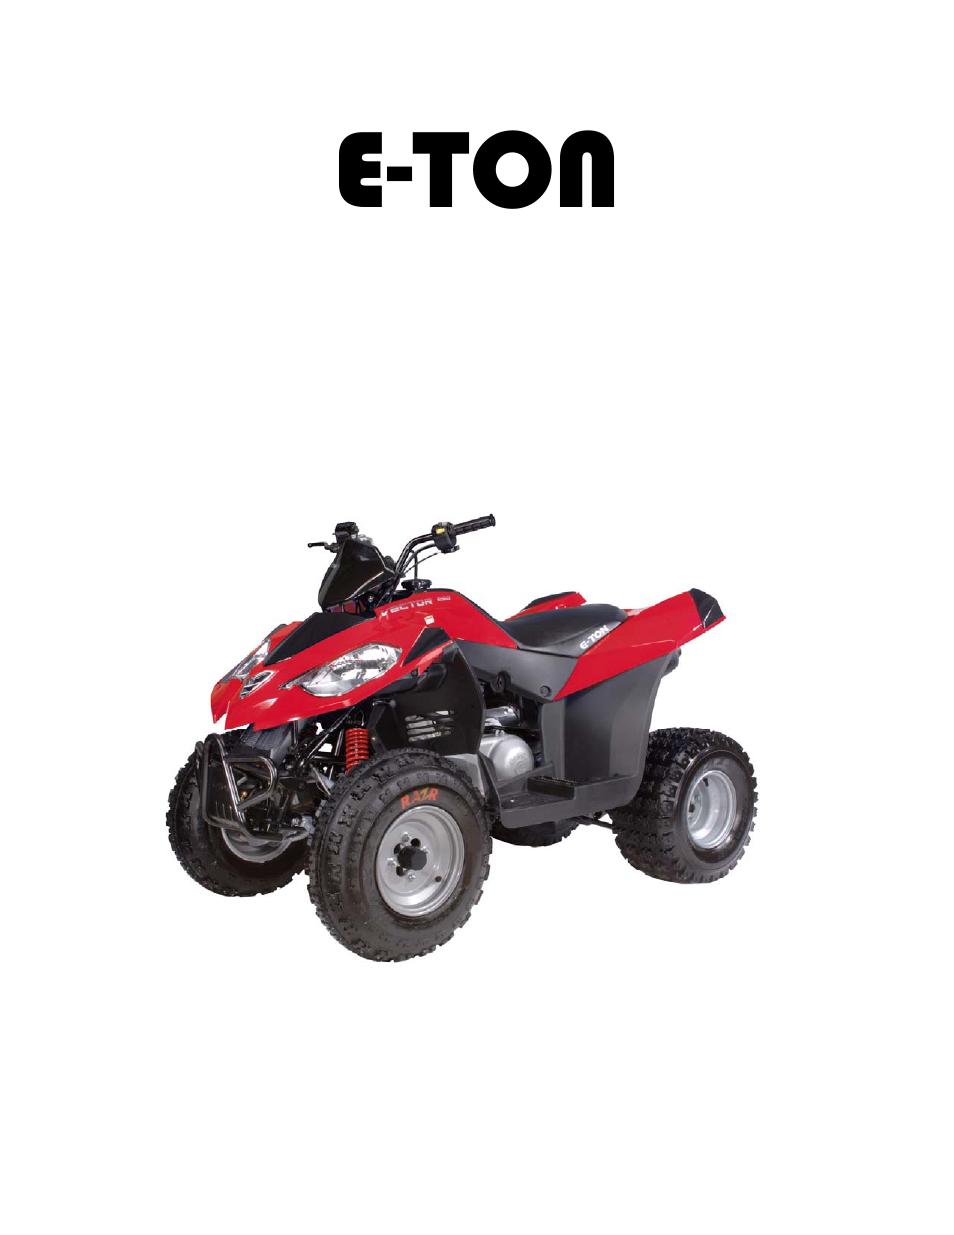 eton exl 150 atv service repair pdf manual download 2004 2009 Array - eton  vector 250r user manual 32 pages rh manualsdir ...